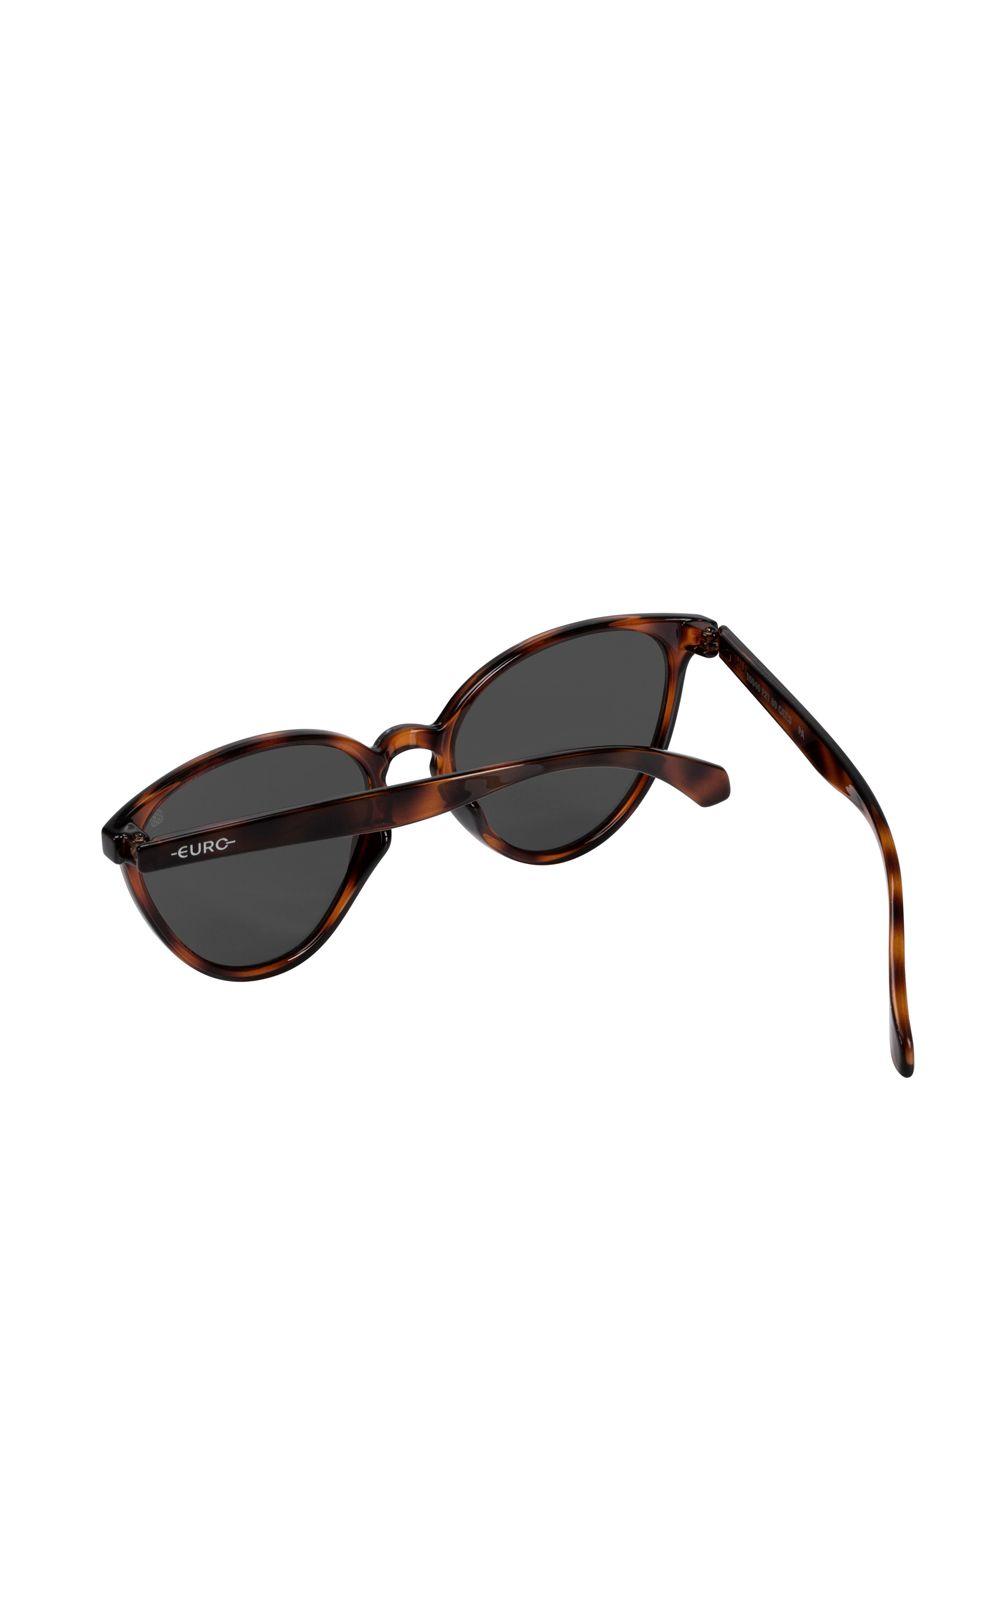 Foto 3 - Óculos Euro Geometric Trendy Tartaruga E0040F2180/8K